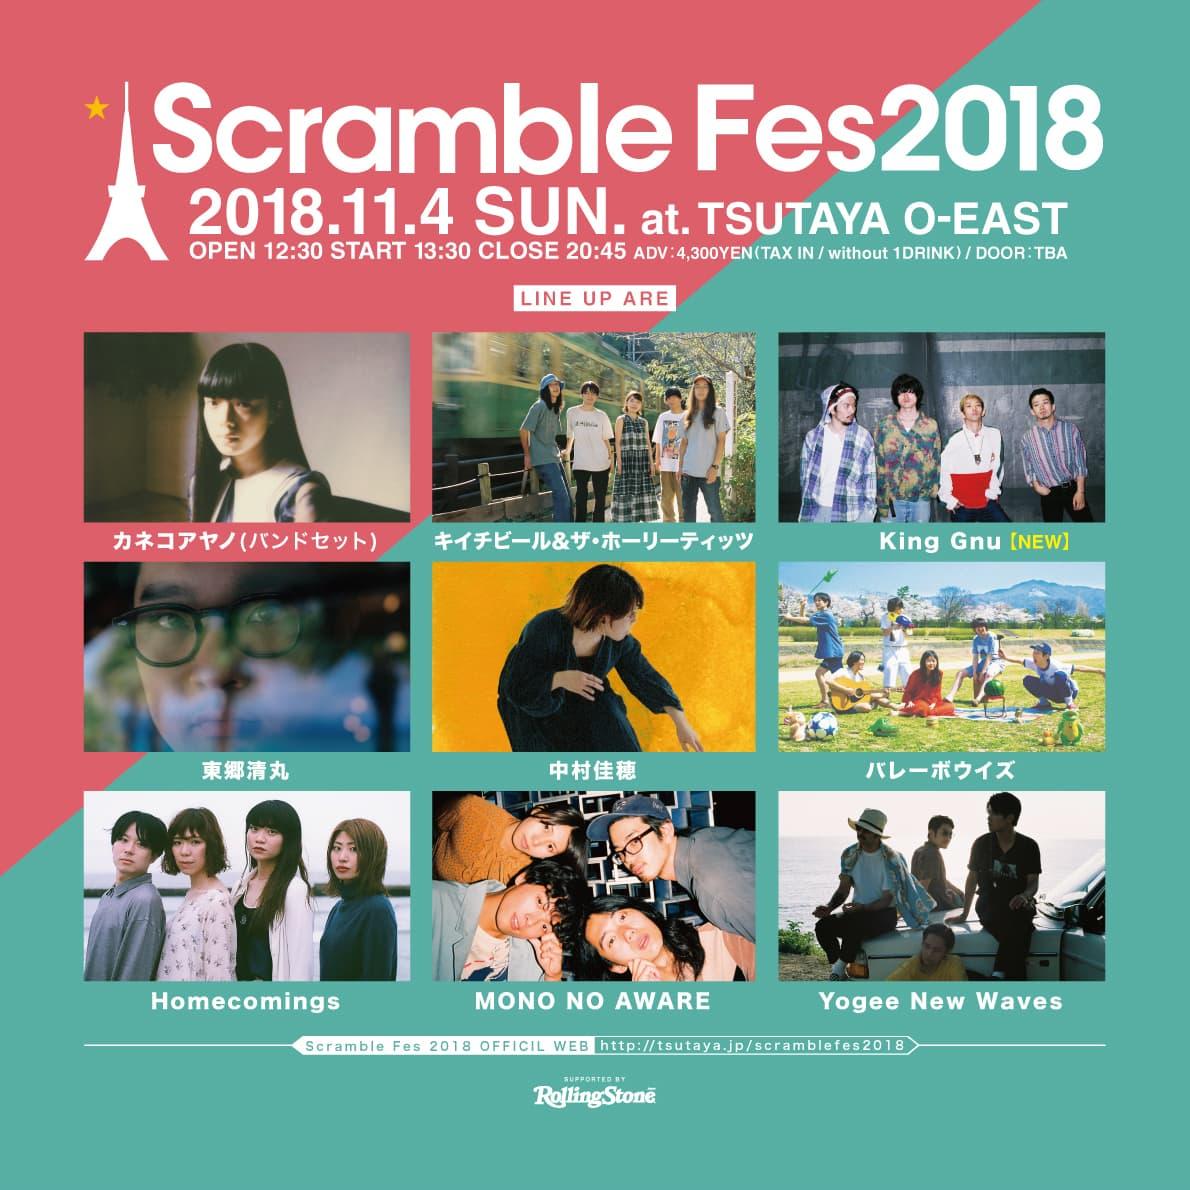 「Scramble Fes 2018」 タイムテーブル発表、ヘッドライナーはYogee New Waves